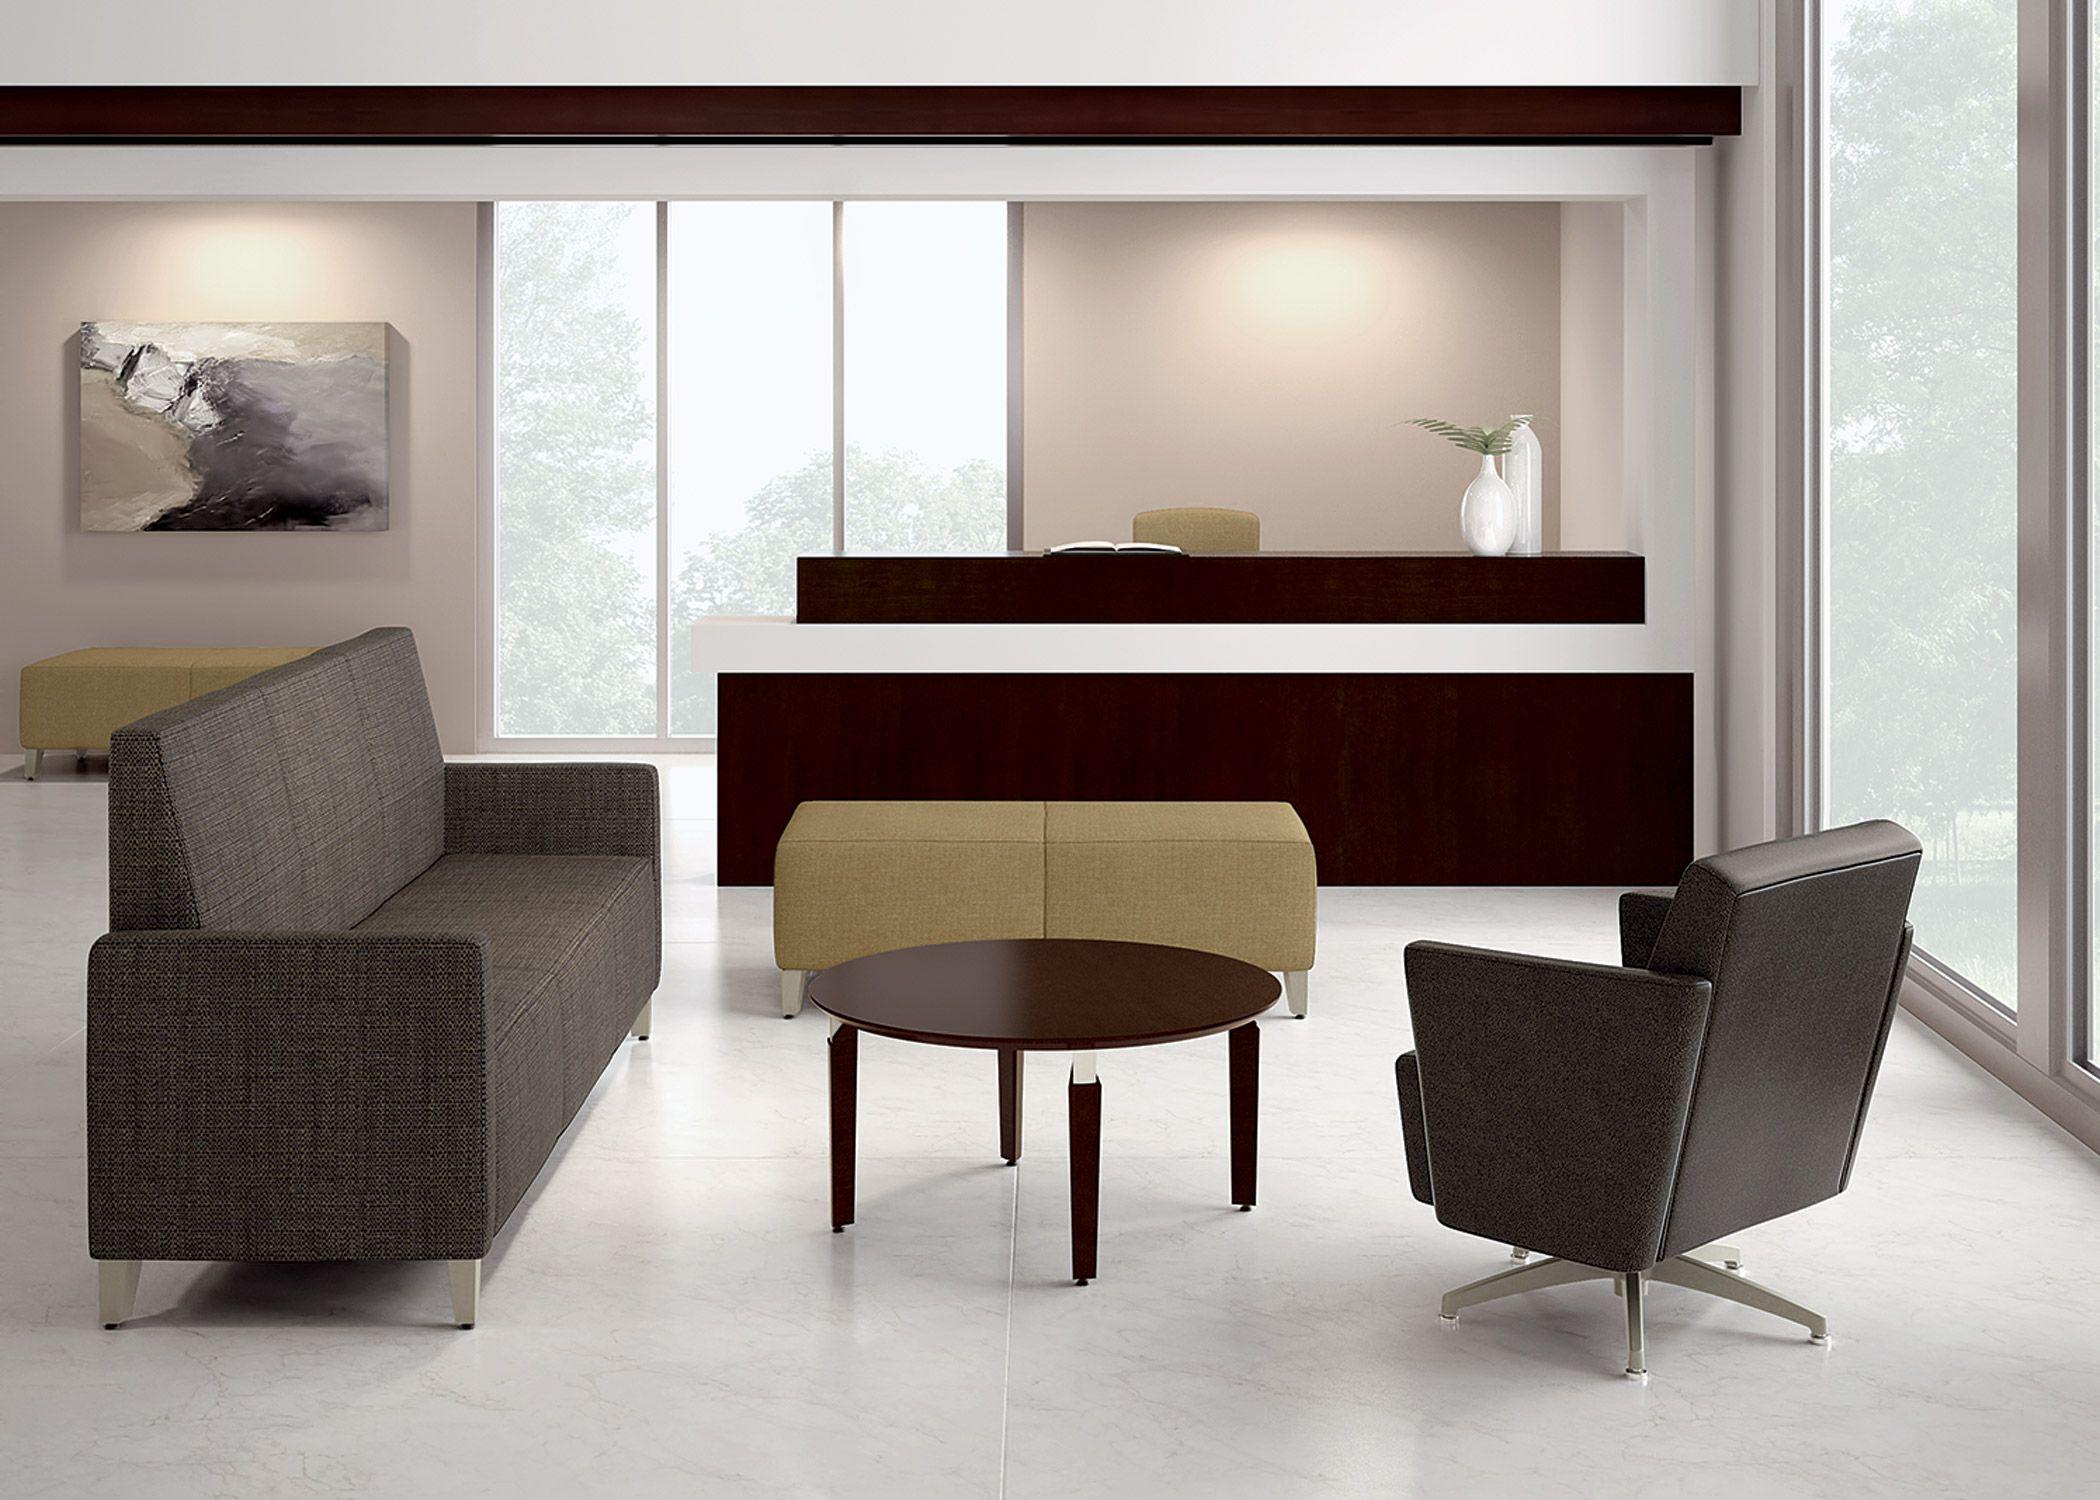 Fringe National fice Furniture Lounge Seating